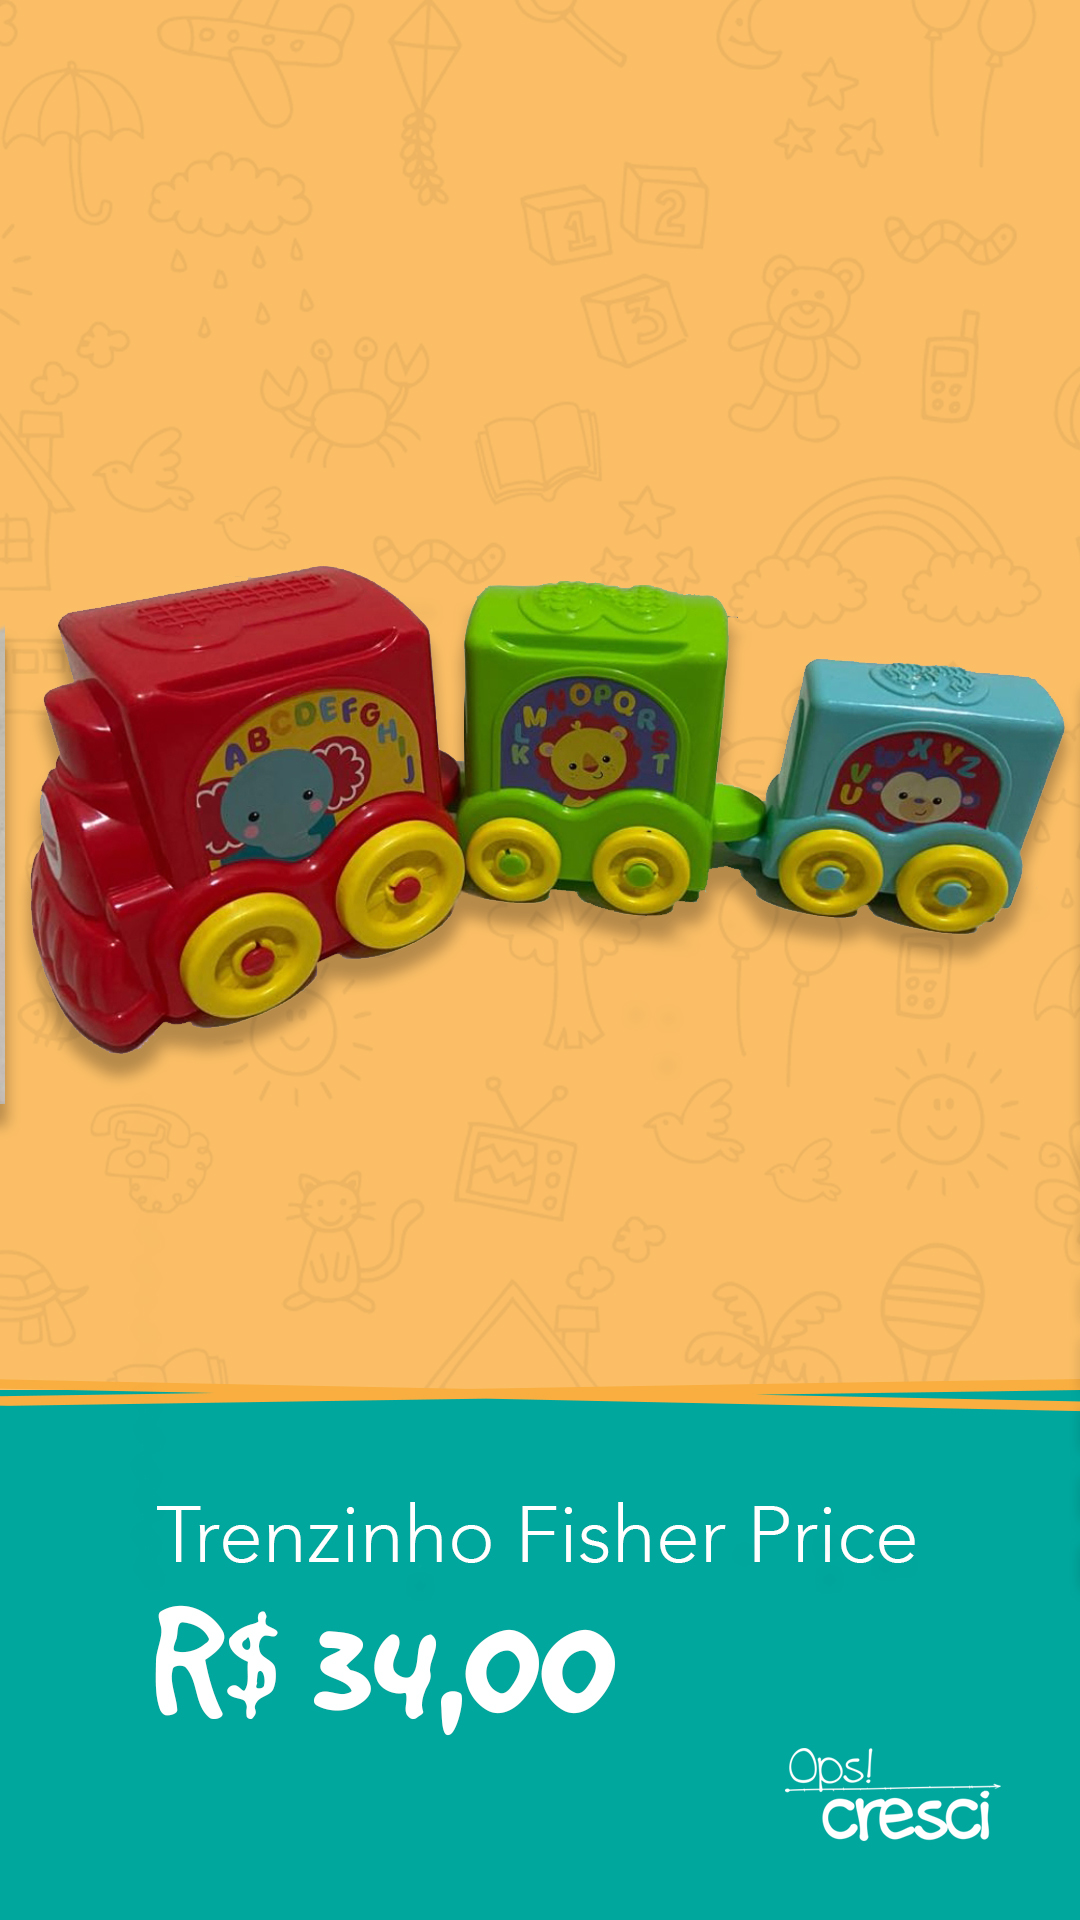 Stories - Brinquedos - 02